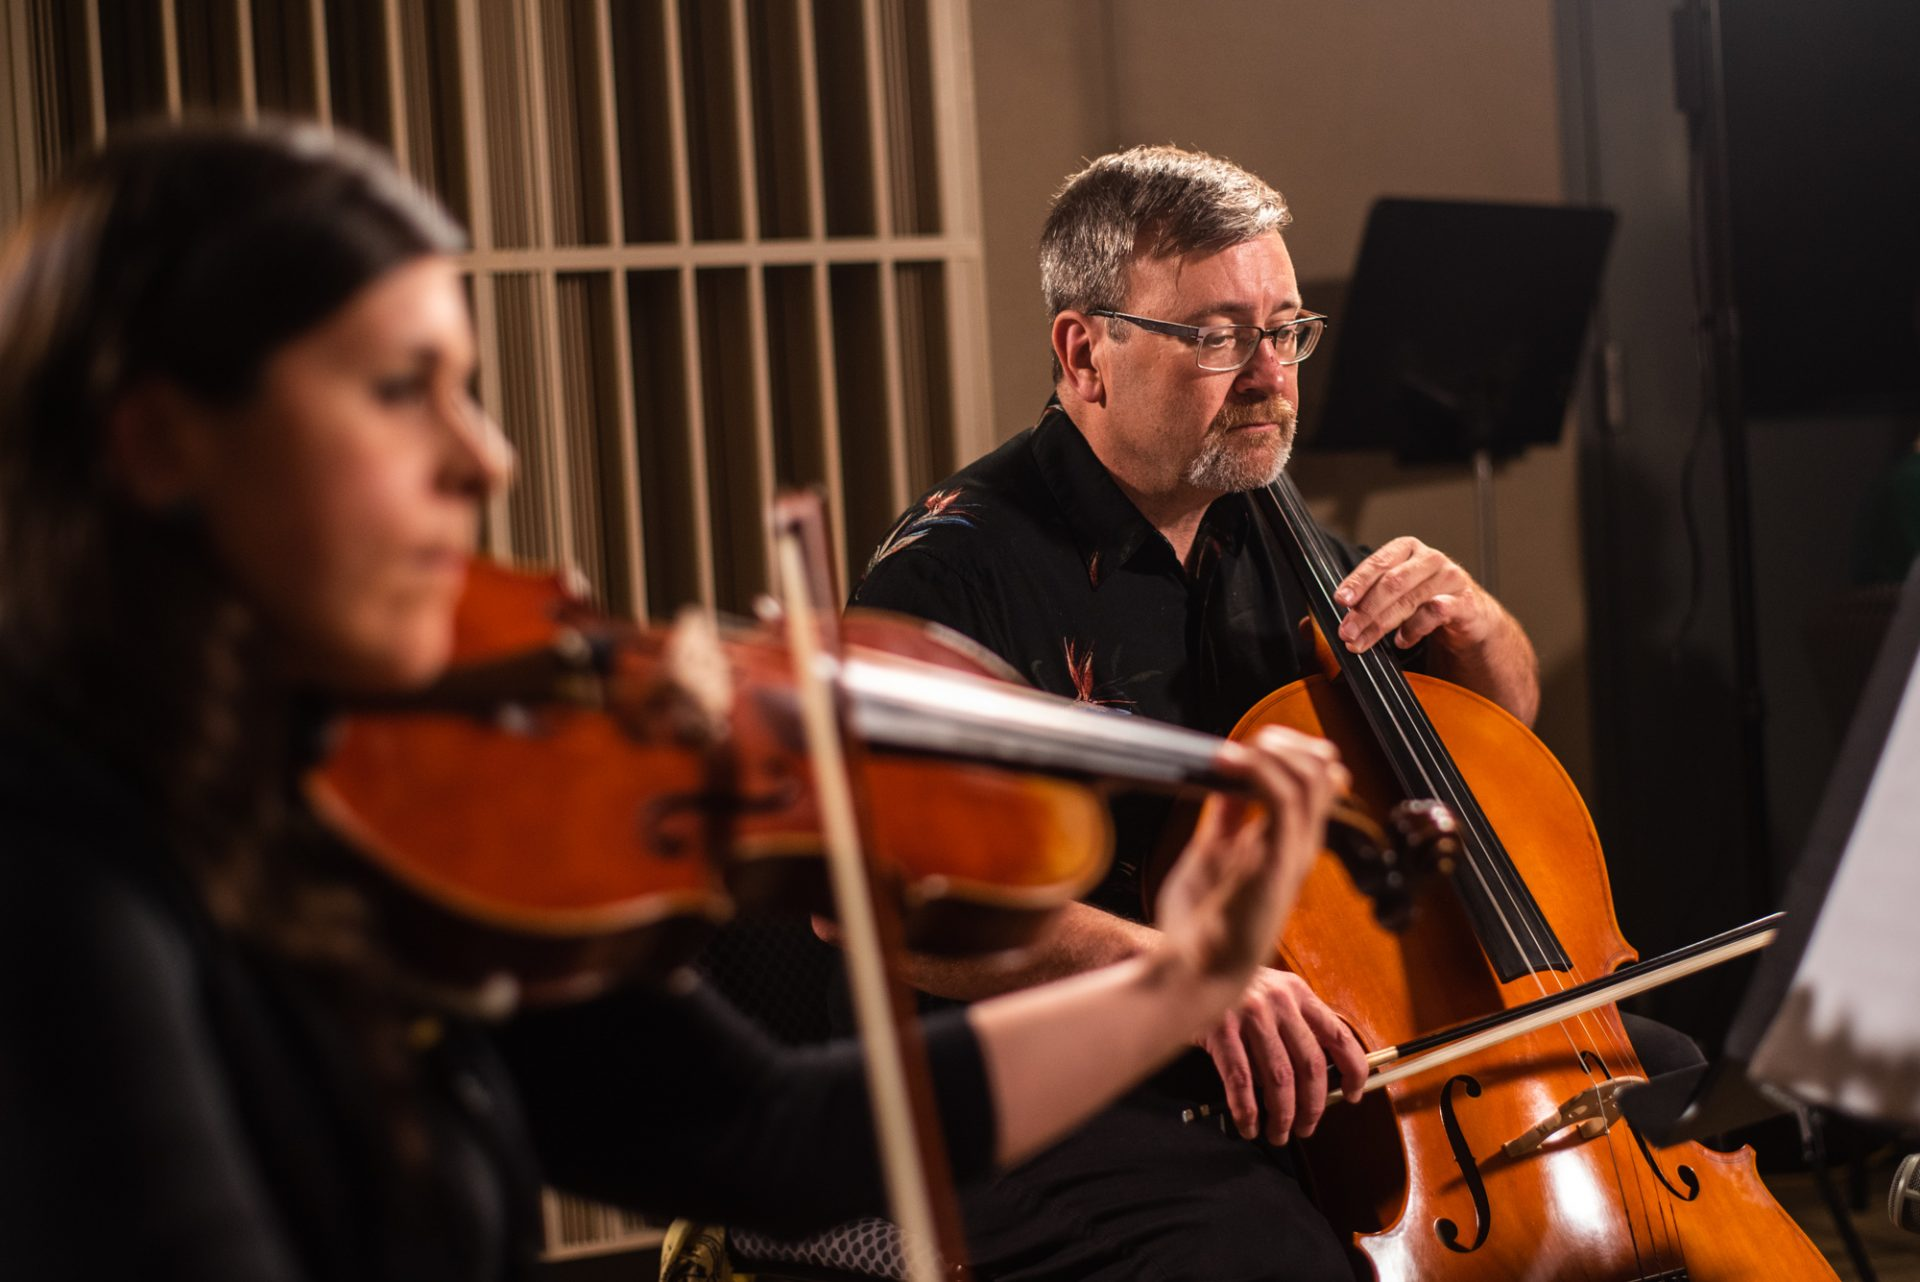 Cellist Matt Masek performing with Sempre Dolce